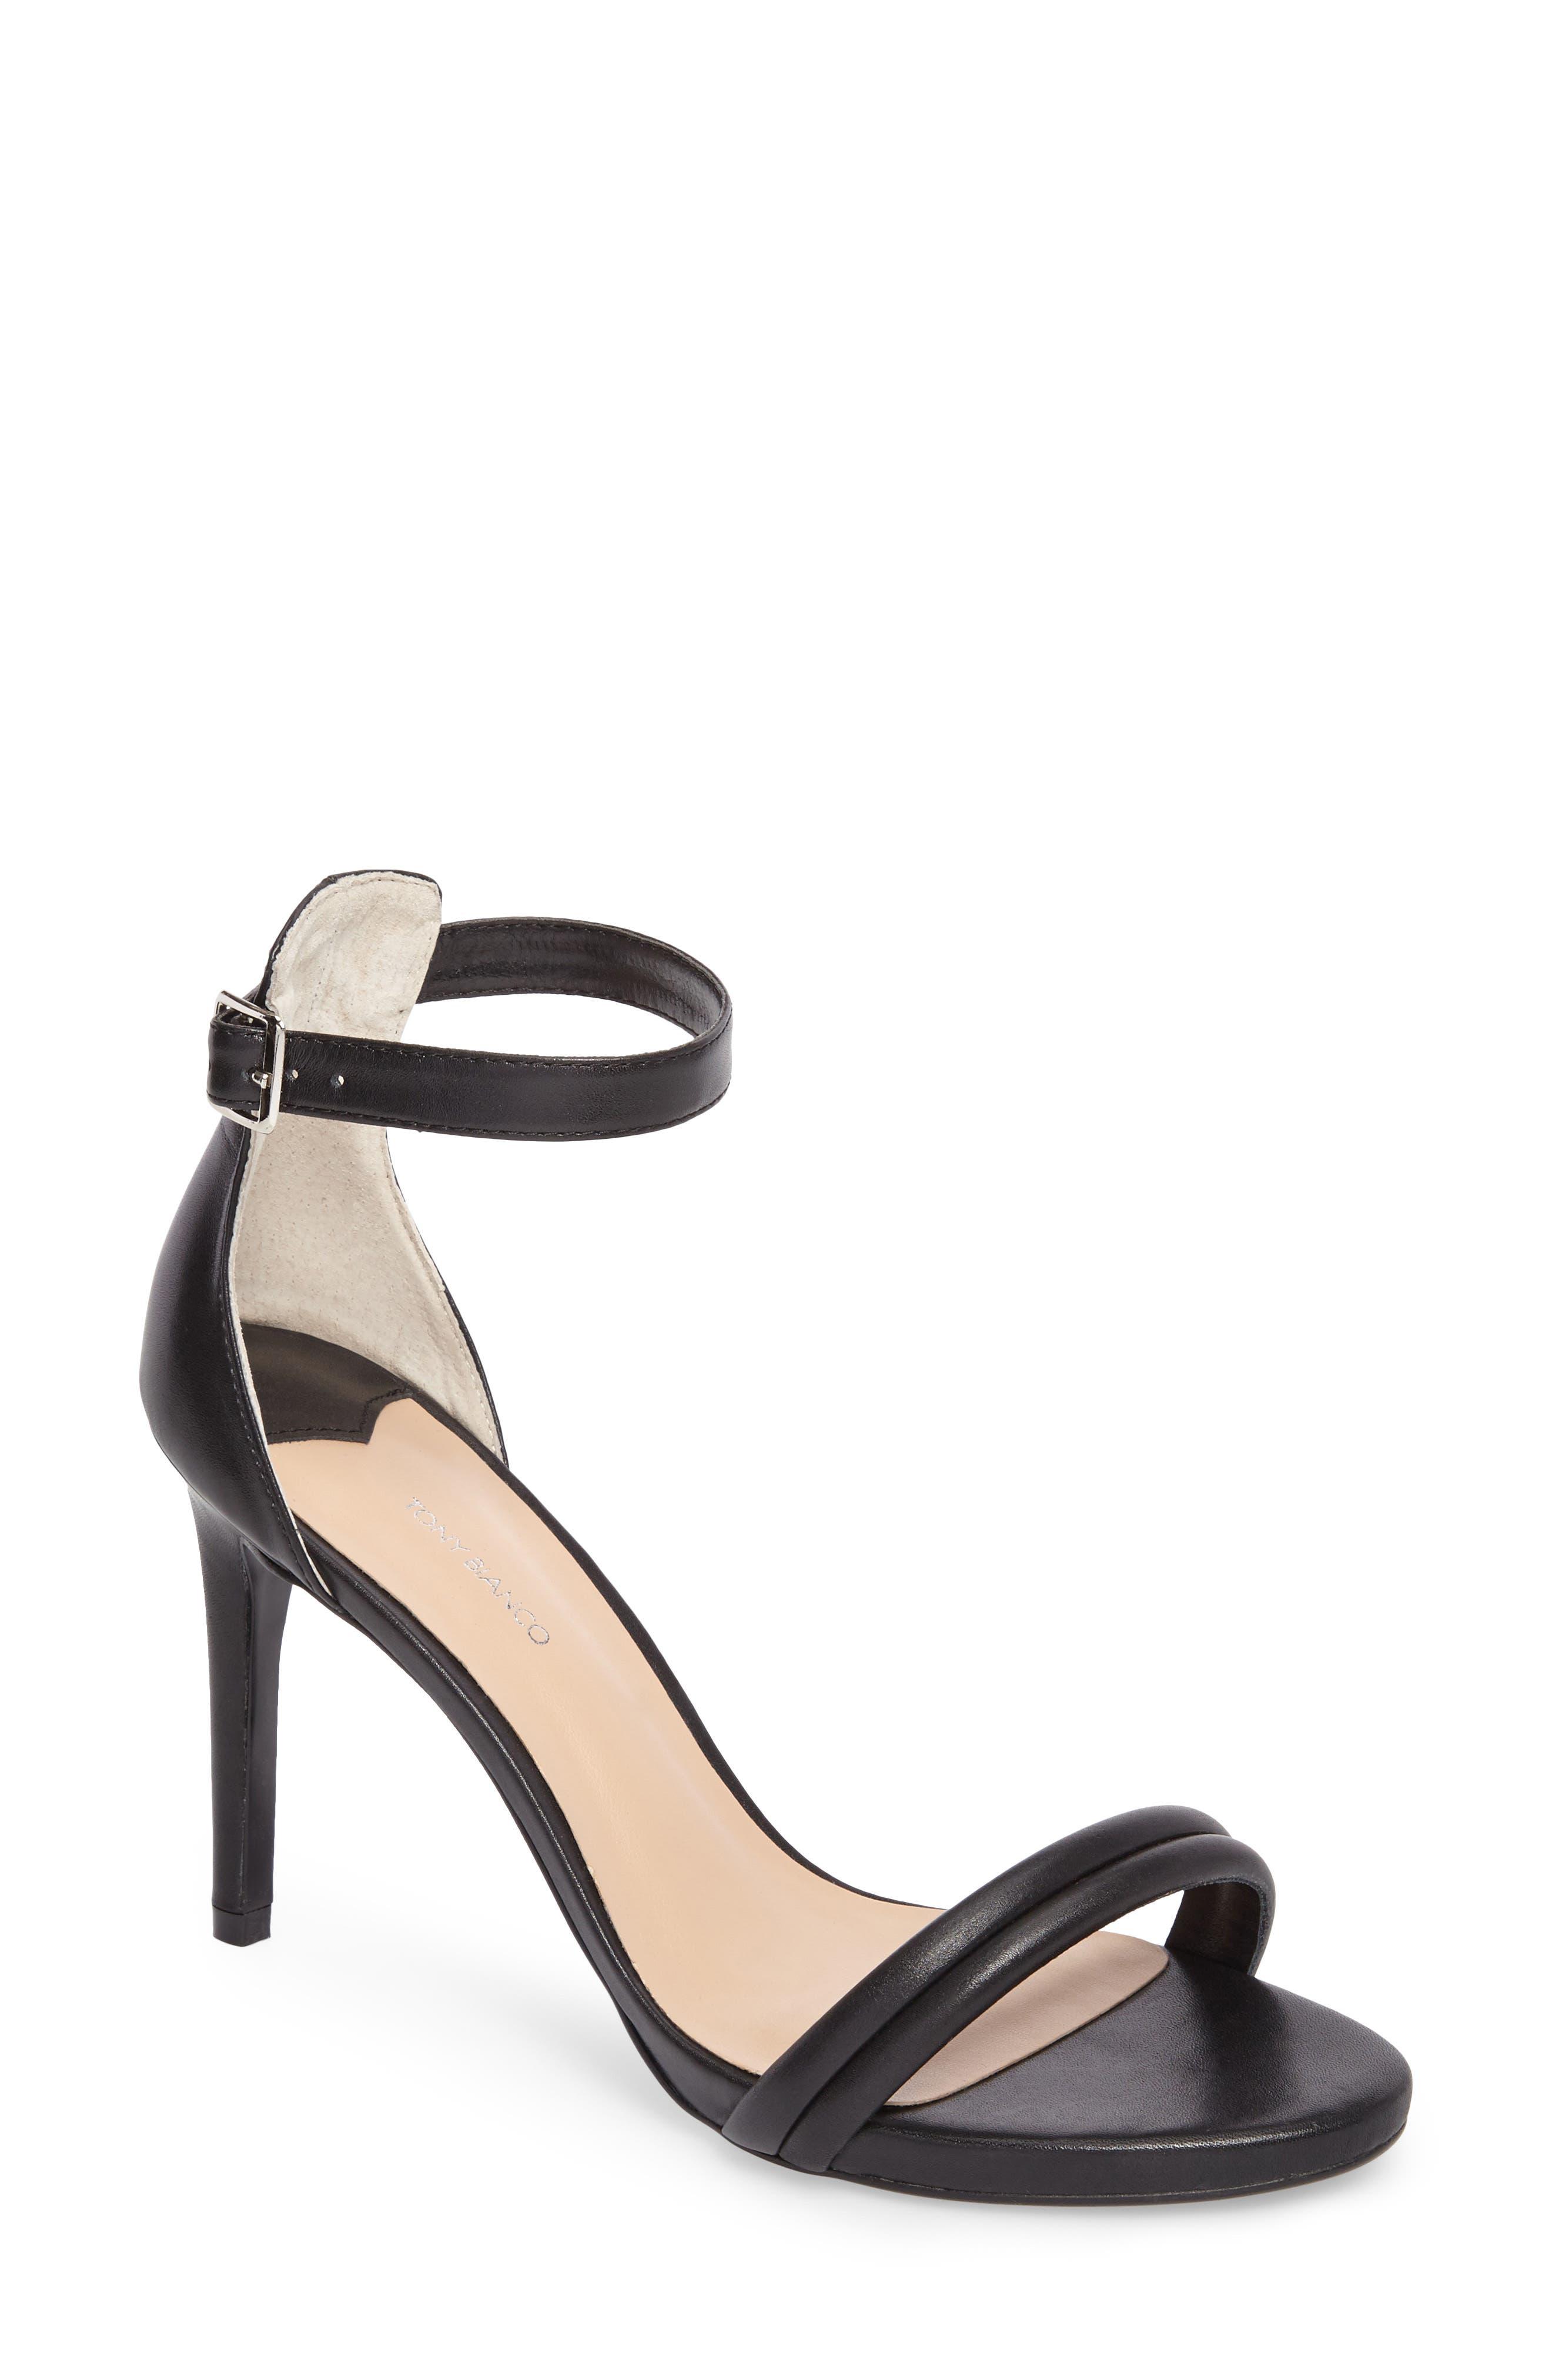 Camila Strappy Sandal,                             Main thumbnail 1, color,                             Black Capretto Leather